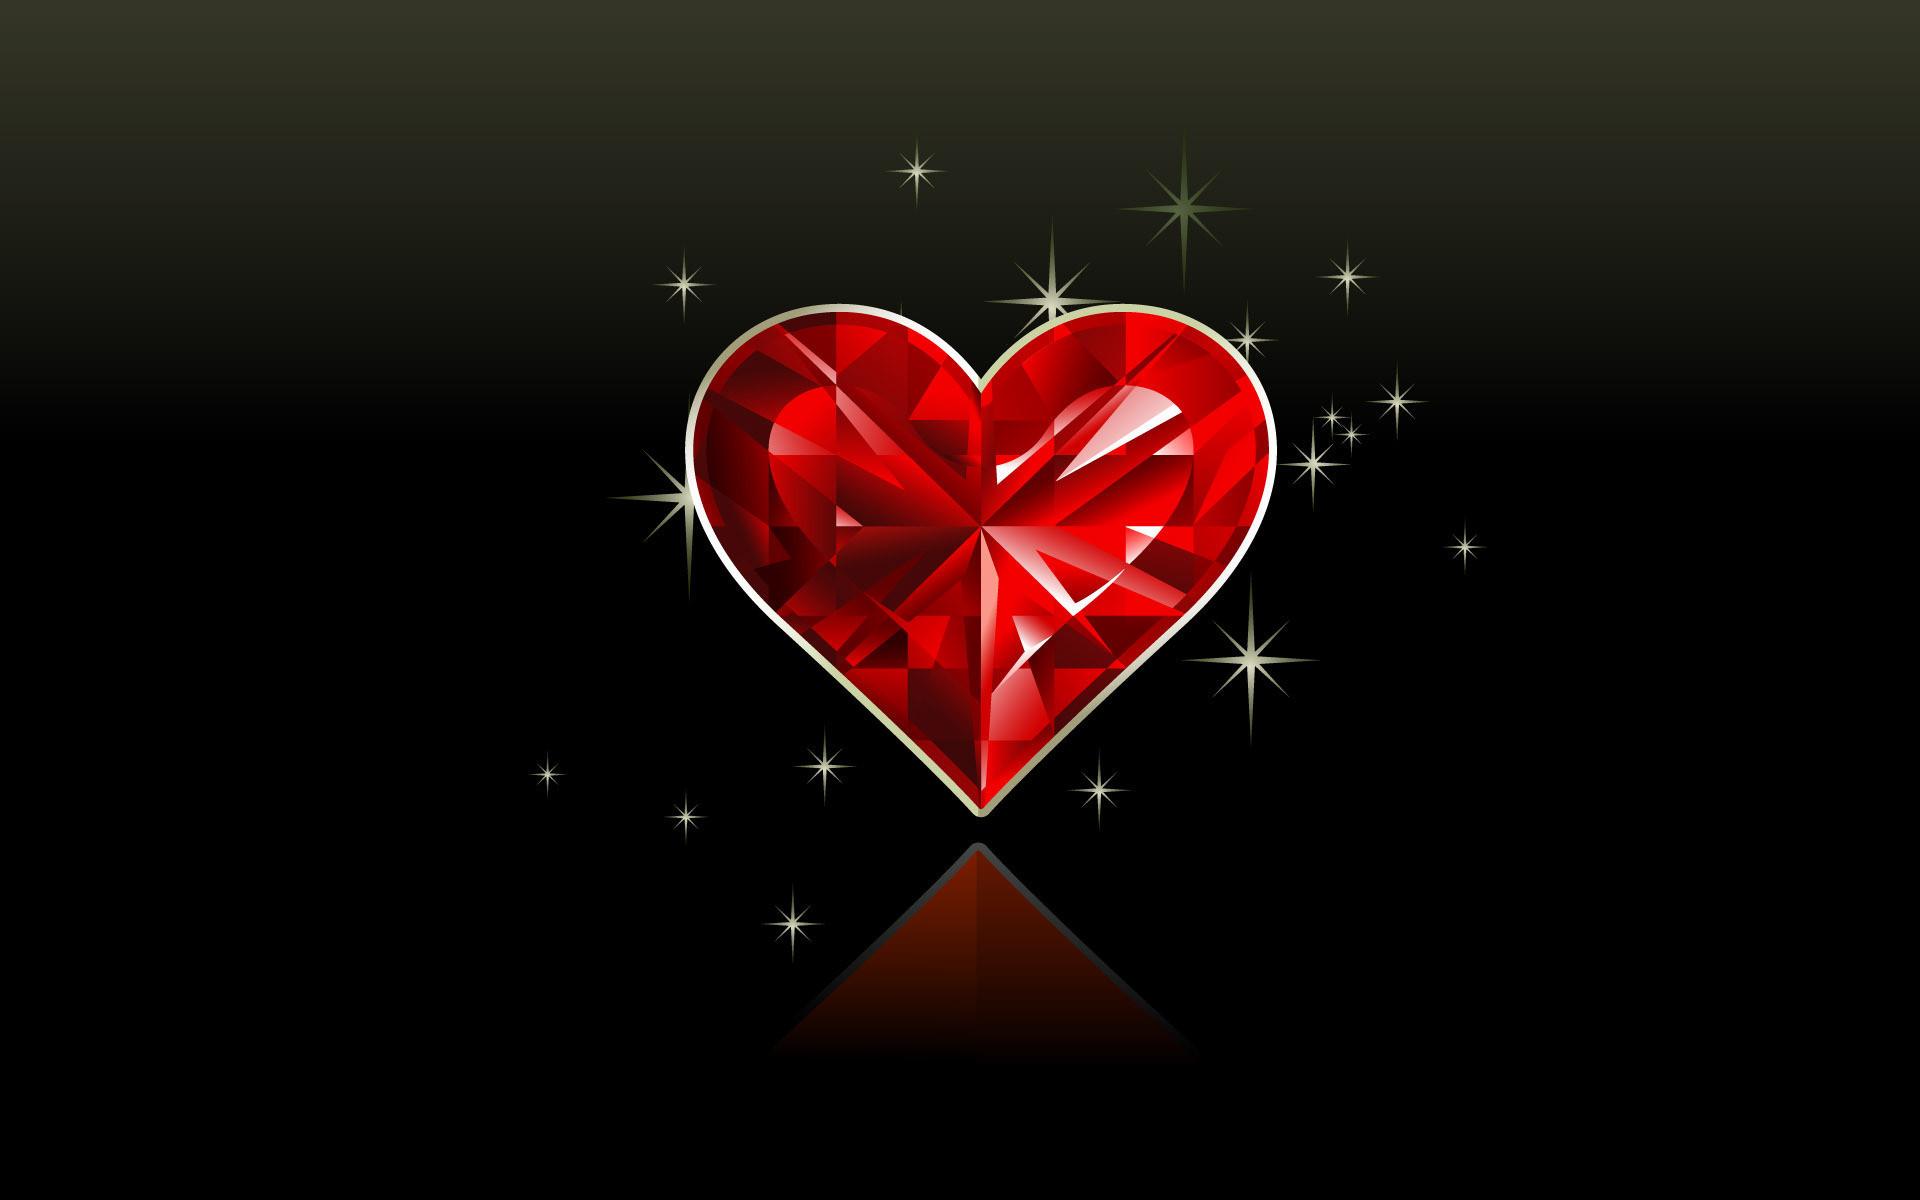 Love Heart Wallpaper Hd Wallpapertag: Cool Heart Wallpapers ·① WallpaperTag